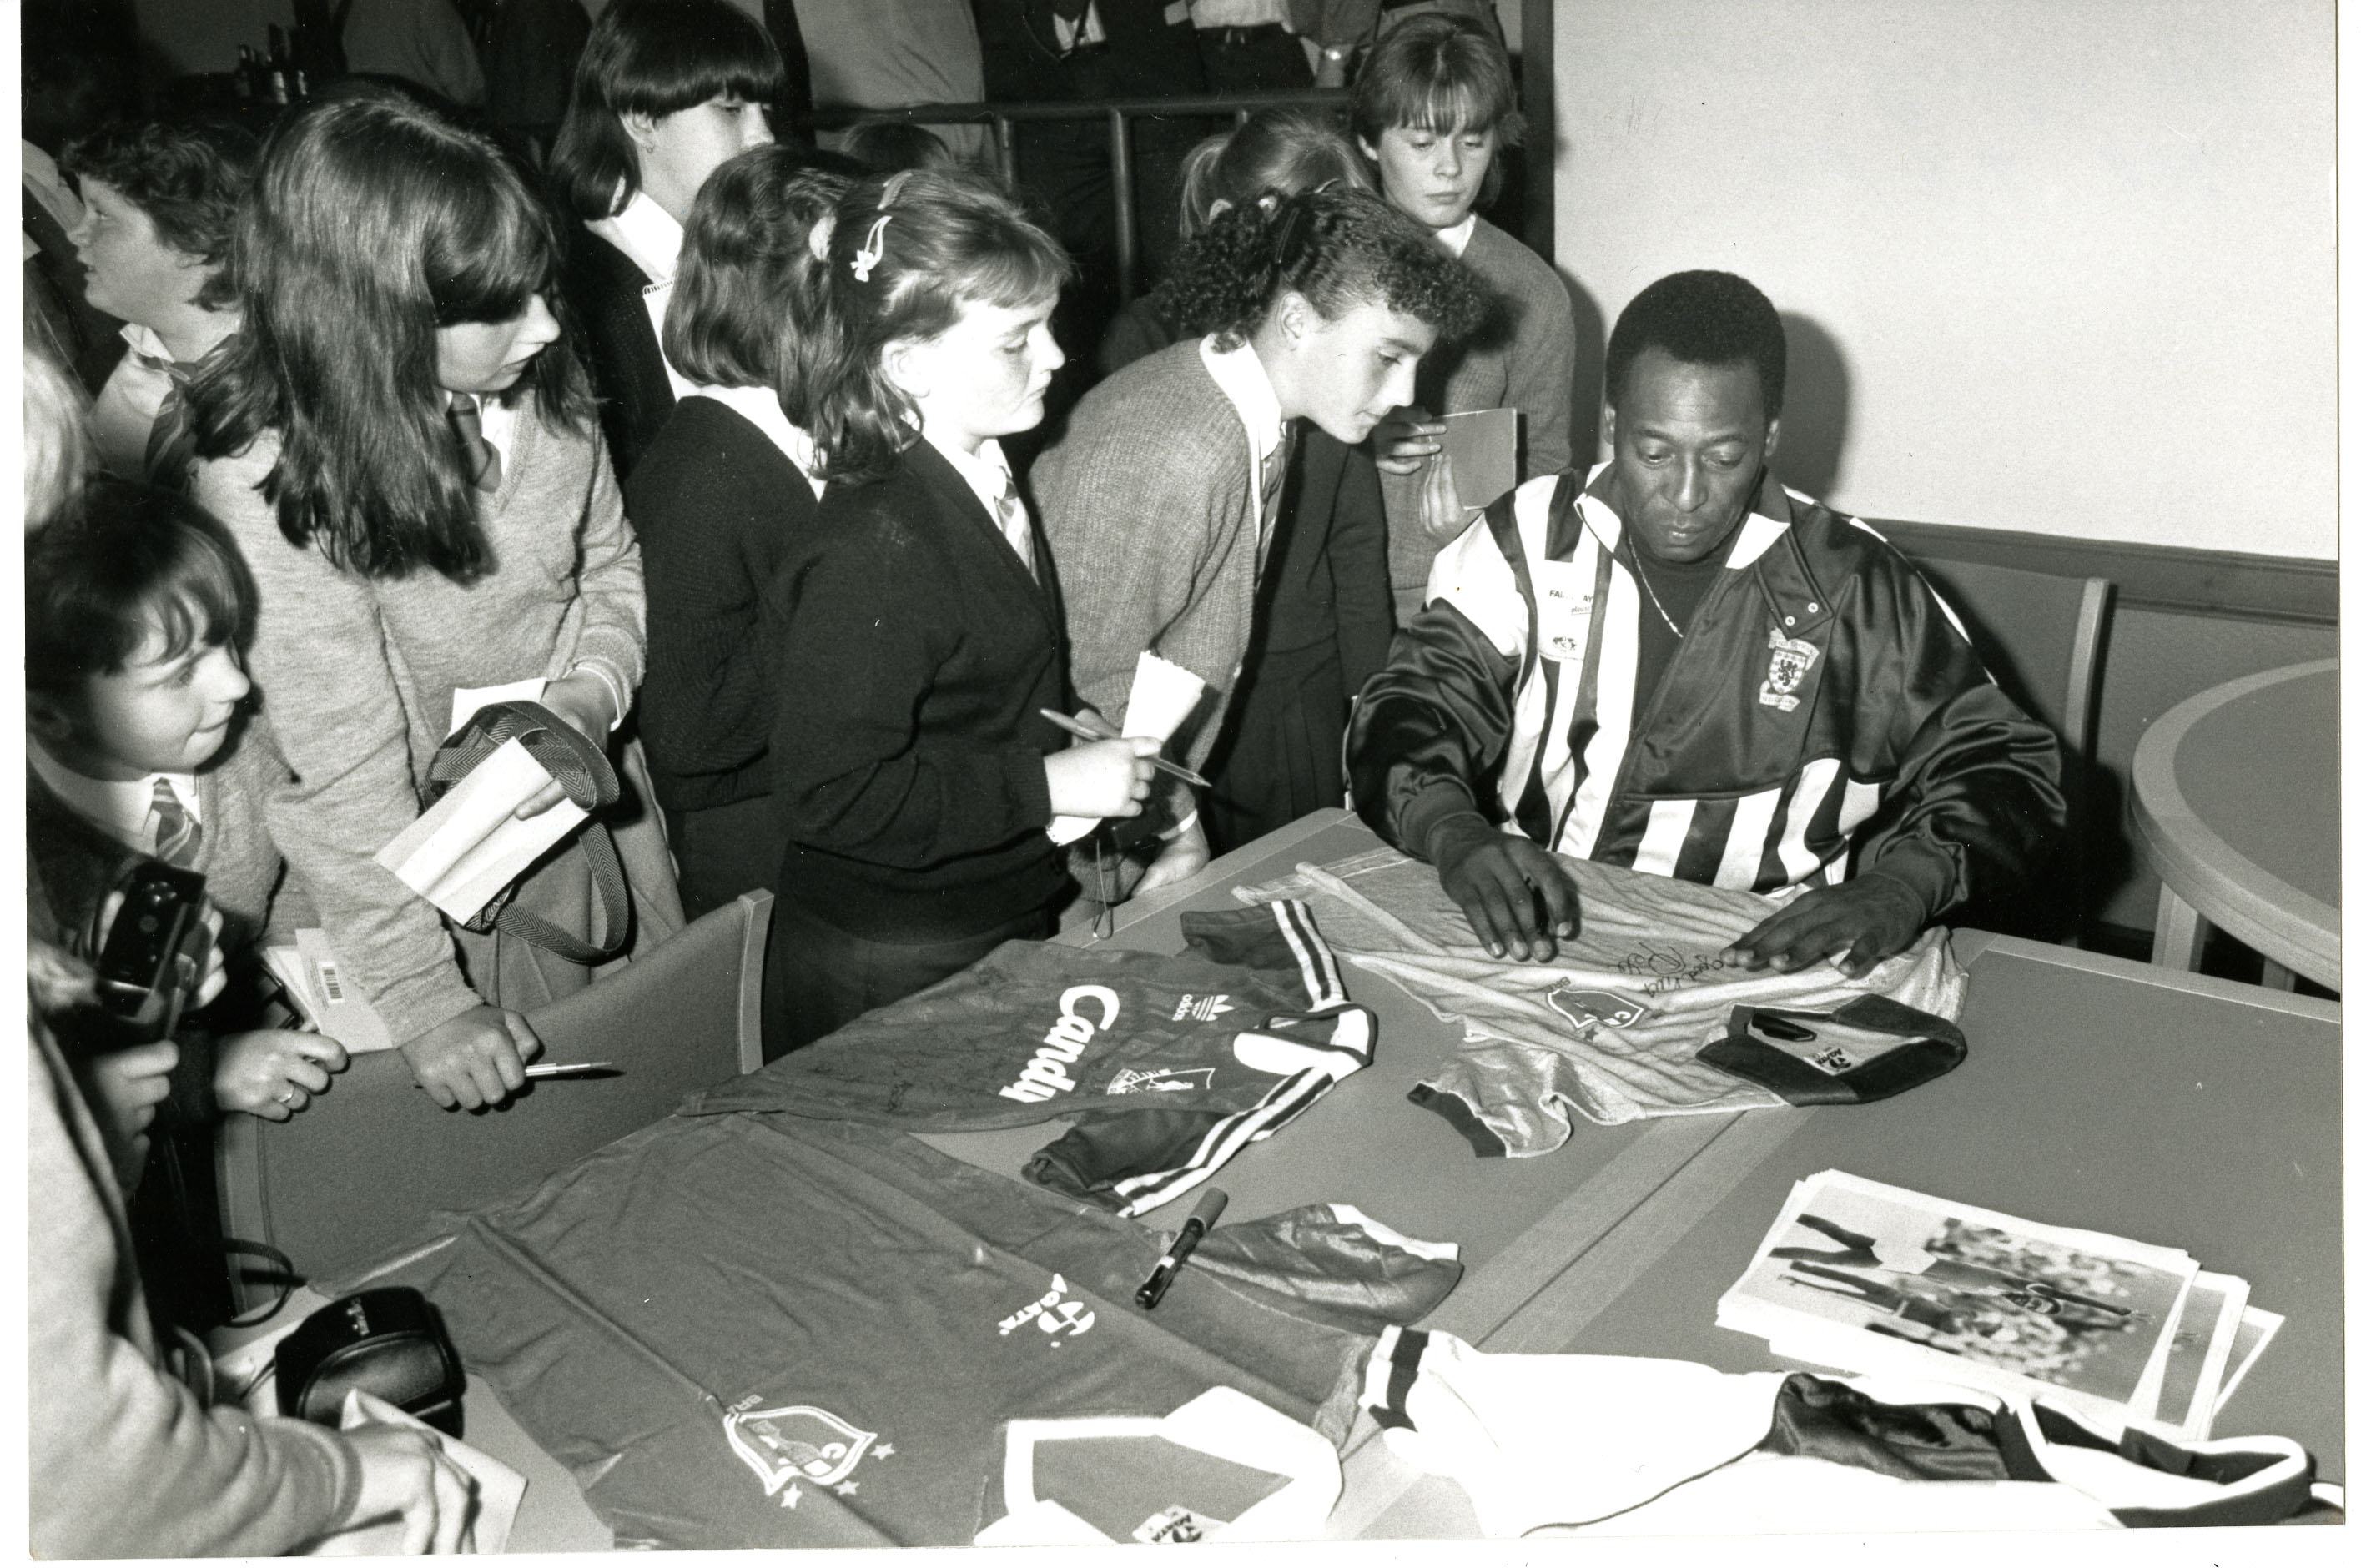 Pele signing autographs at Dens Park.